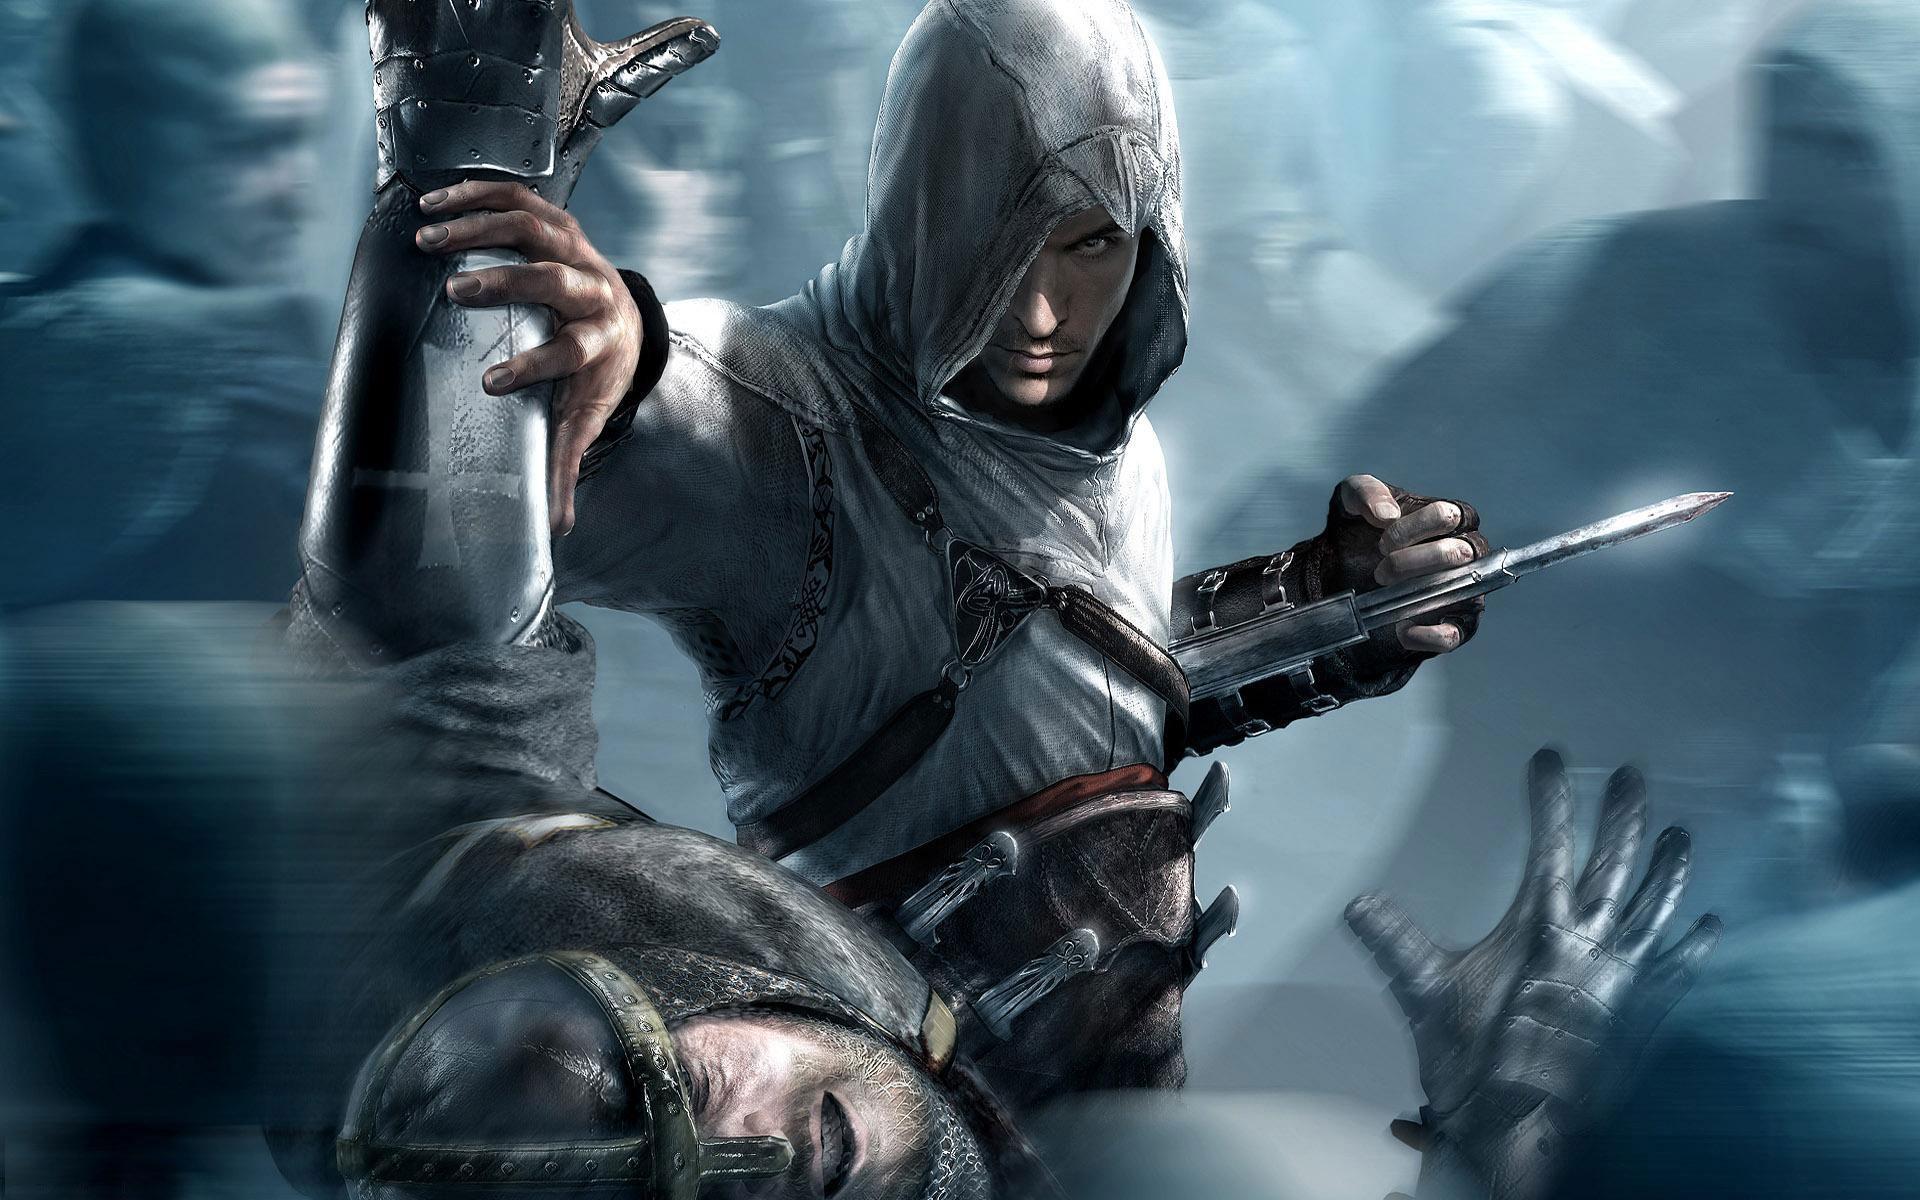 Assassins Creed Wallpaper Hd wallpaper   844031 1920x1200